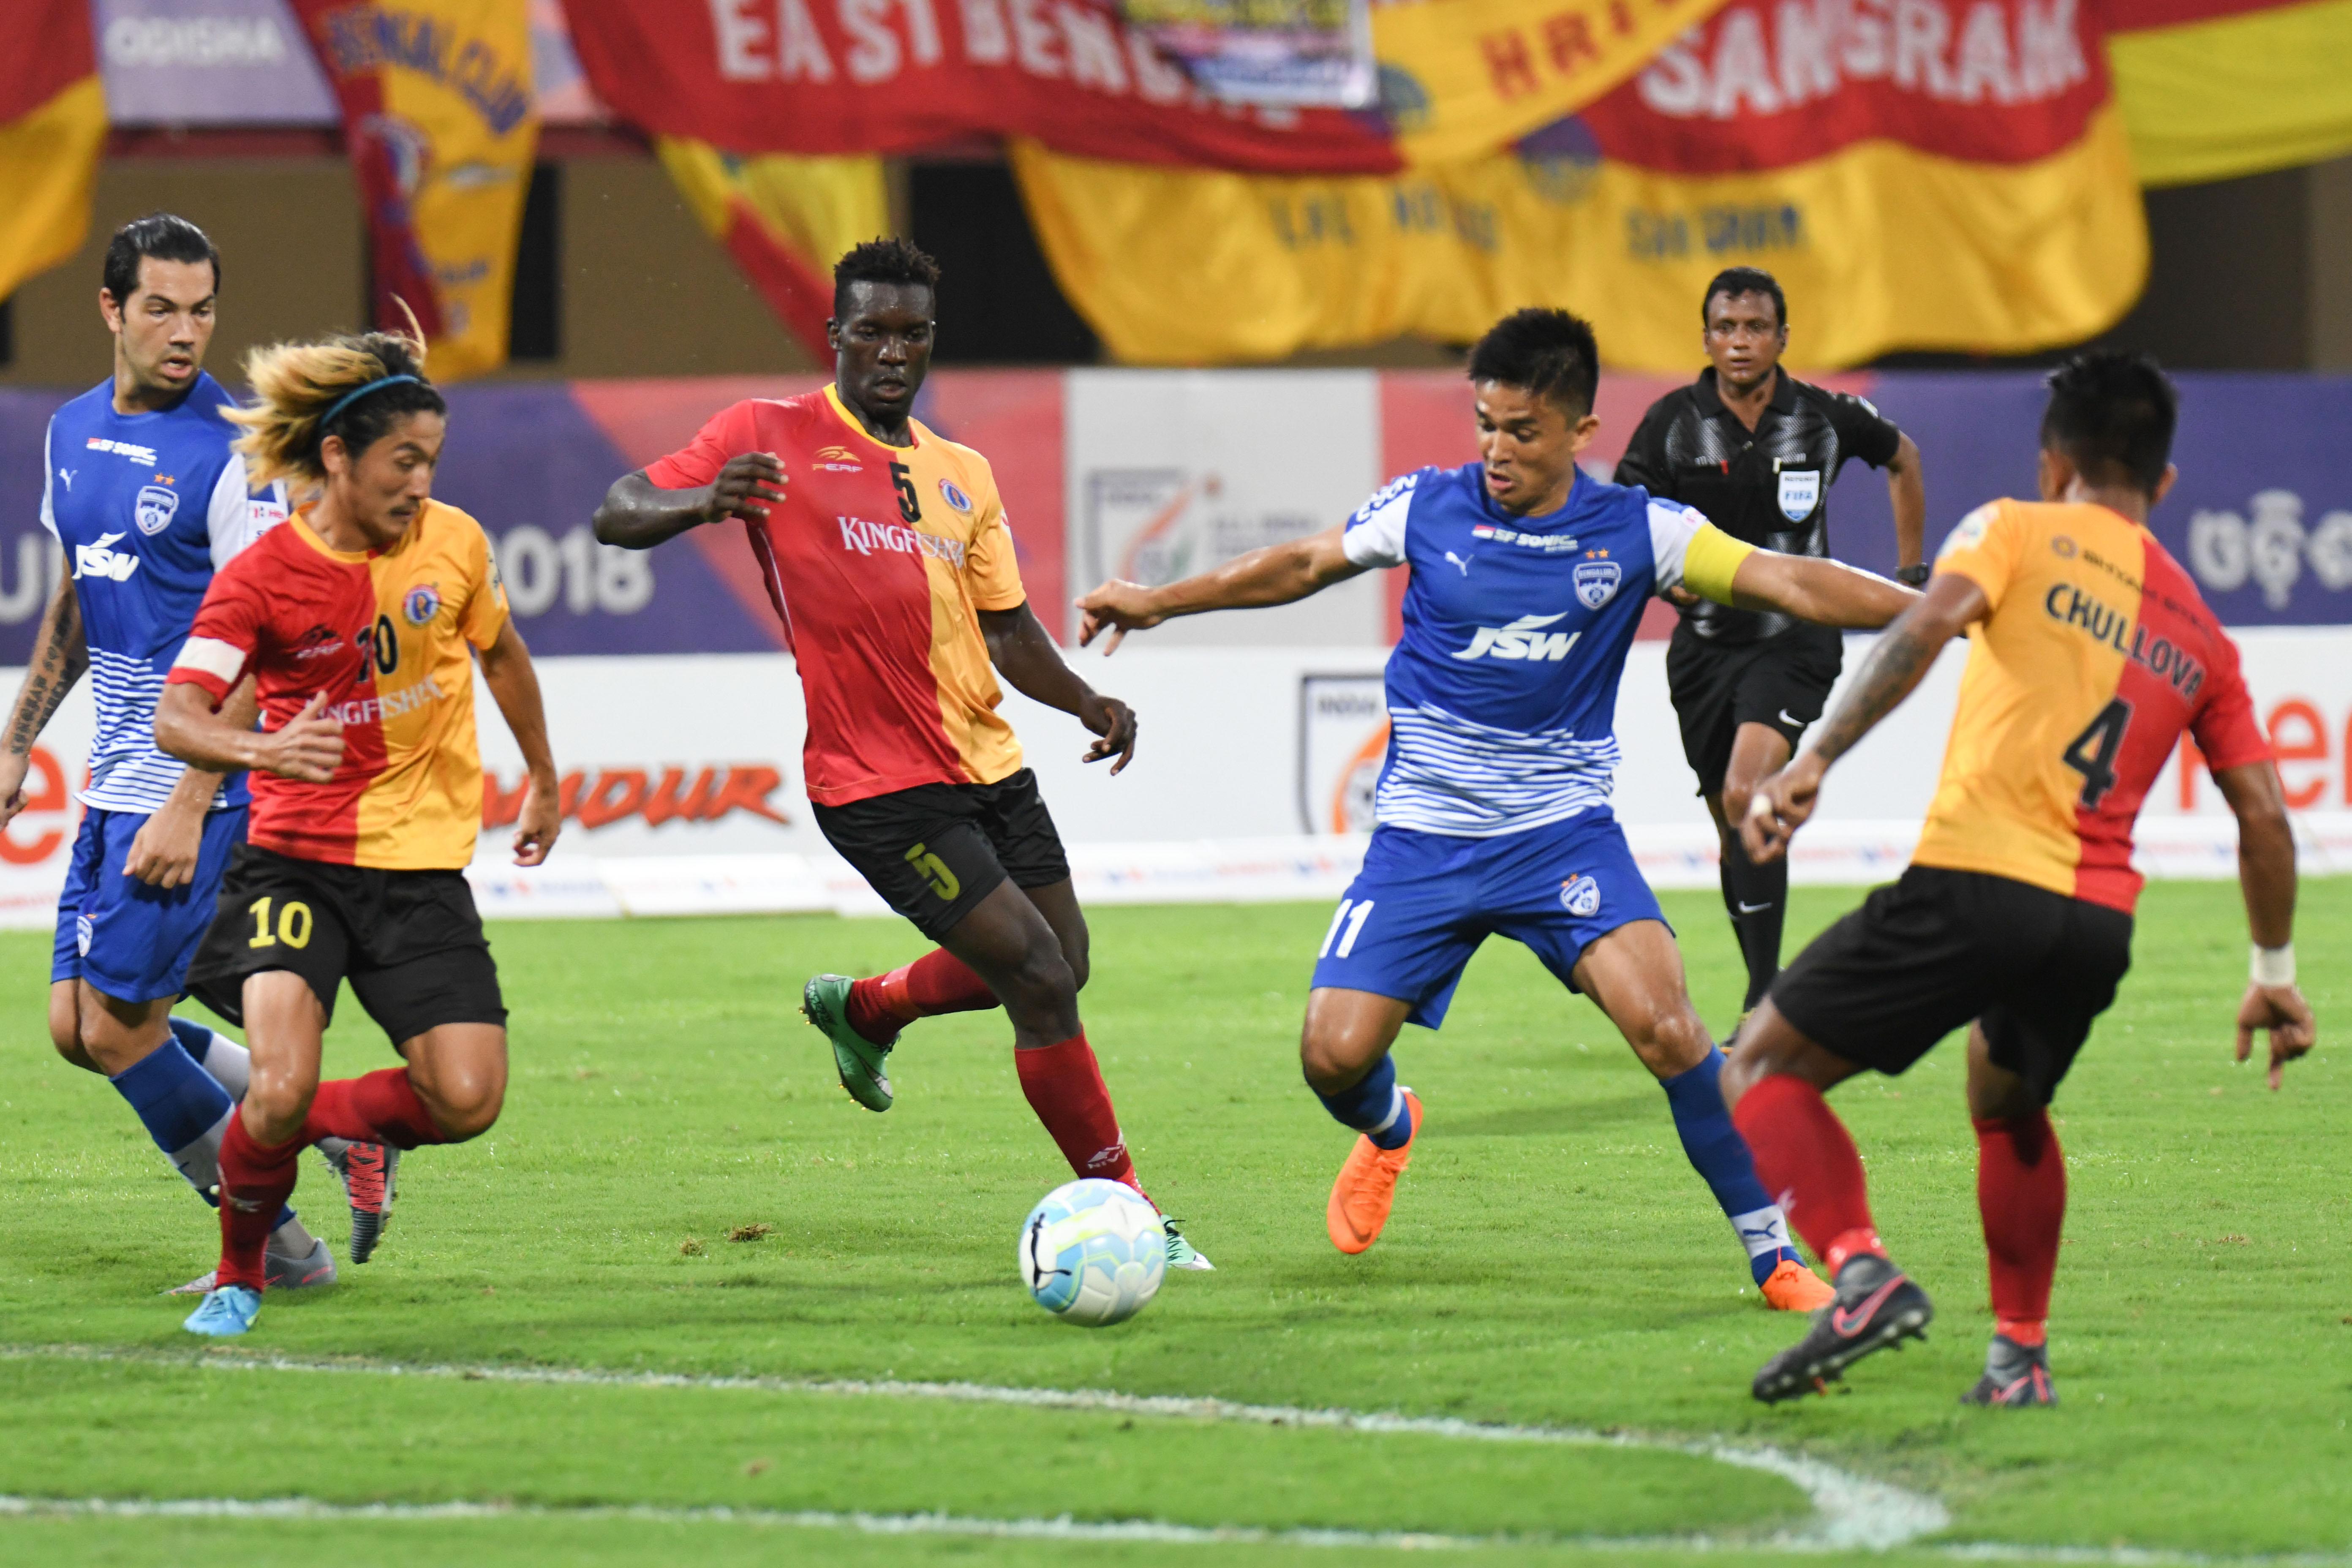 East Bengal Bengaluru FC Super Cup 2018